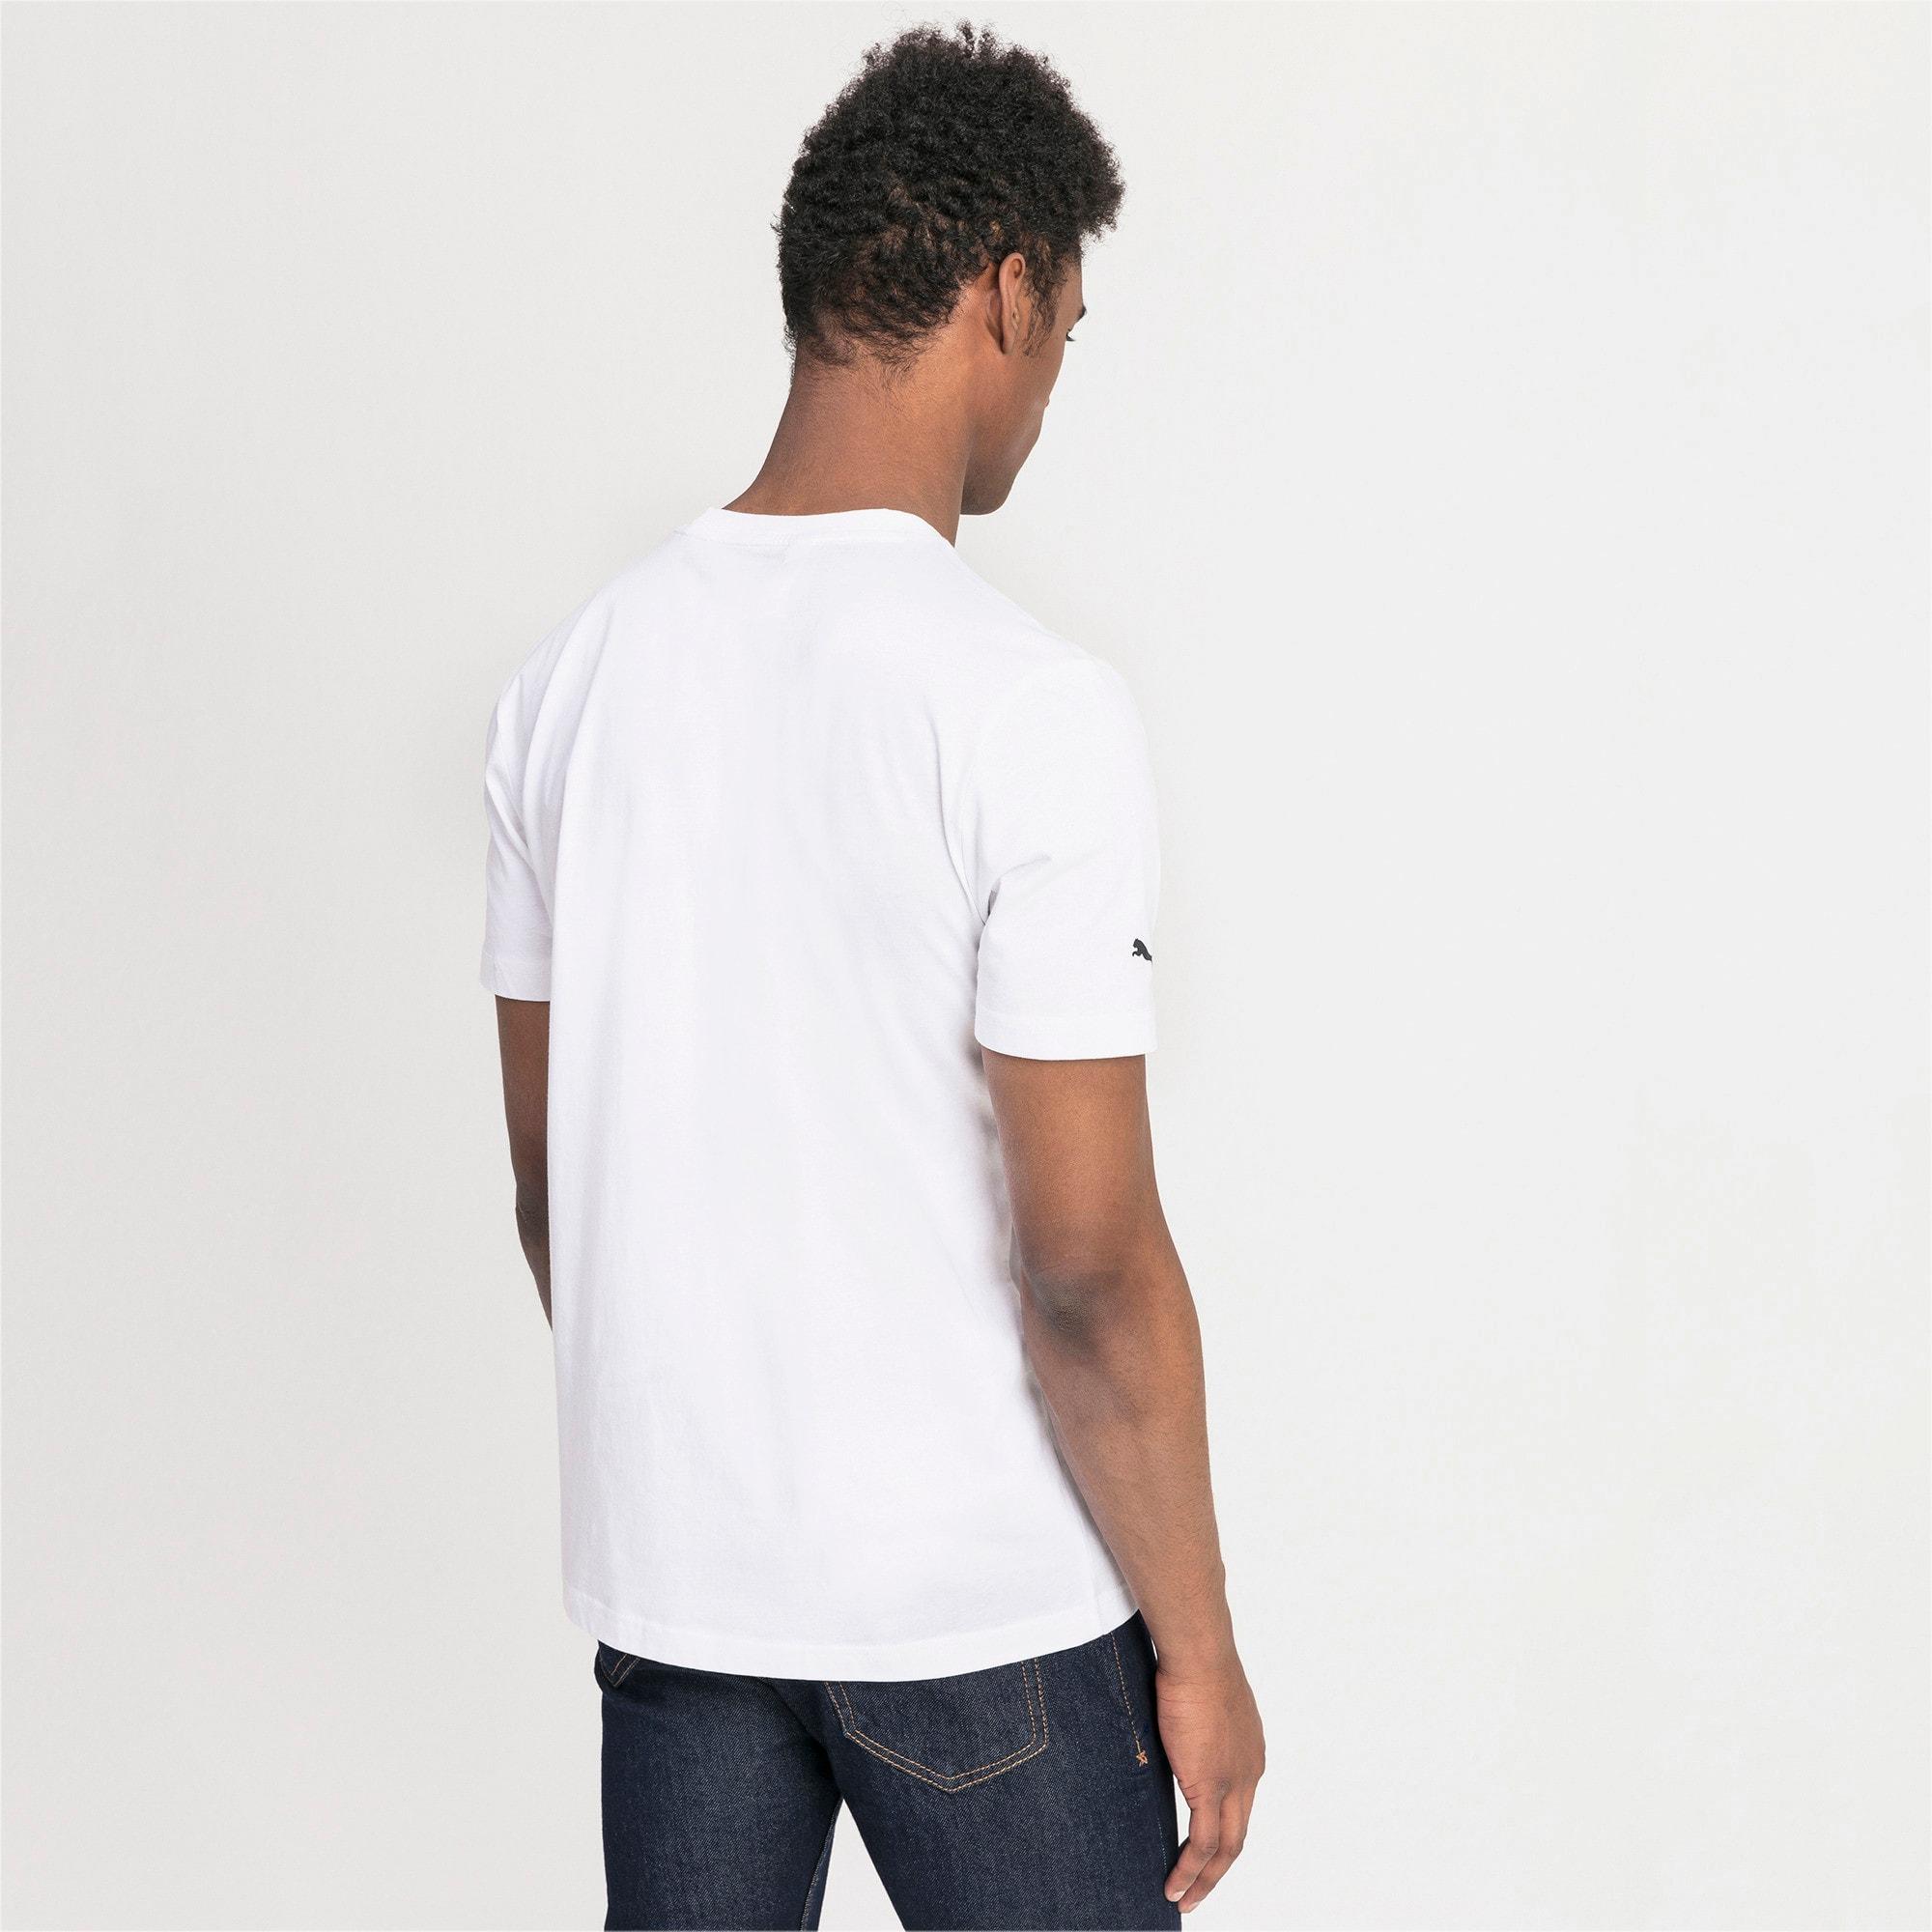 Thumbnail 2 of T-shirt con logo BMW M Motorsport uomo, Puma White, medium